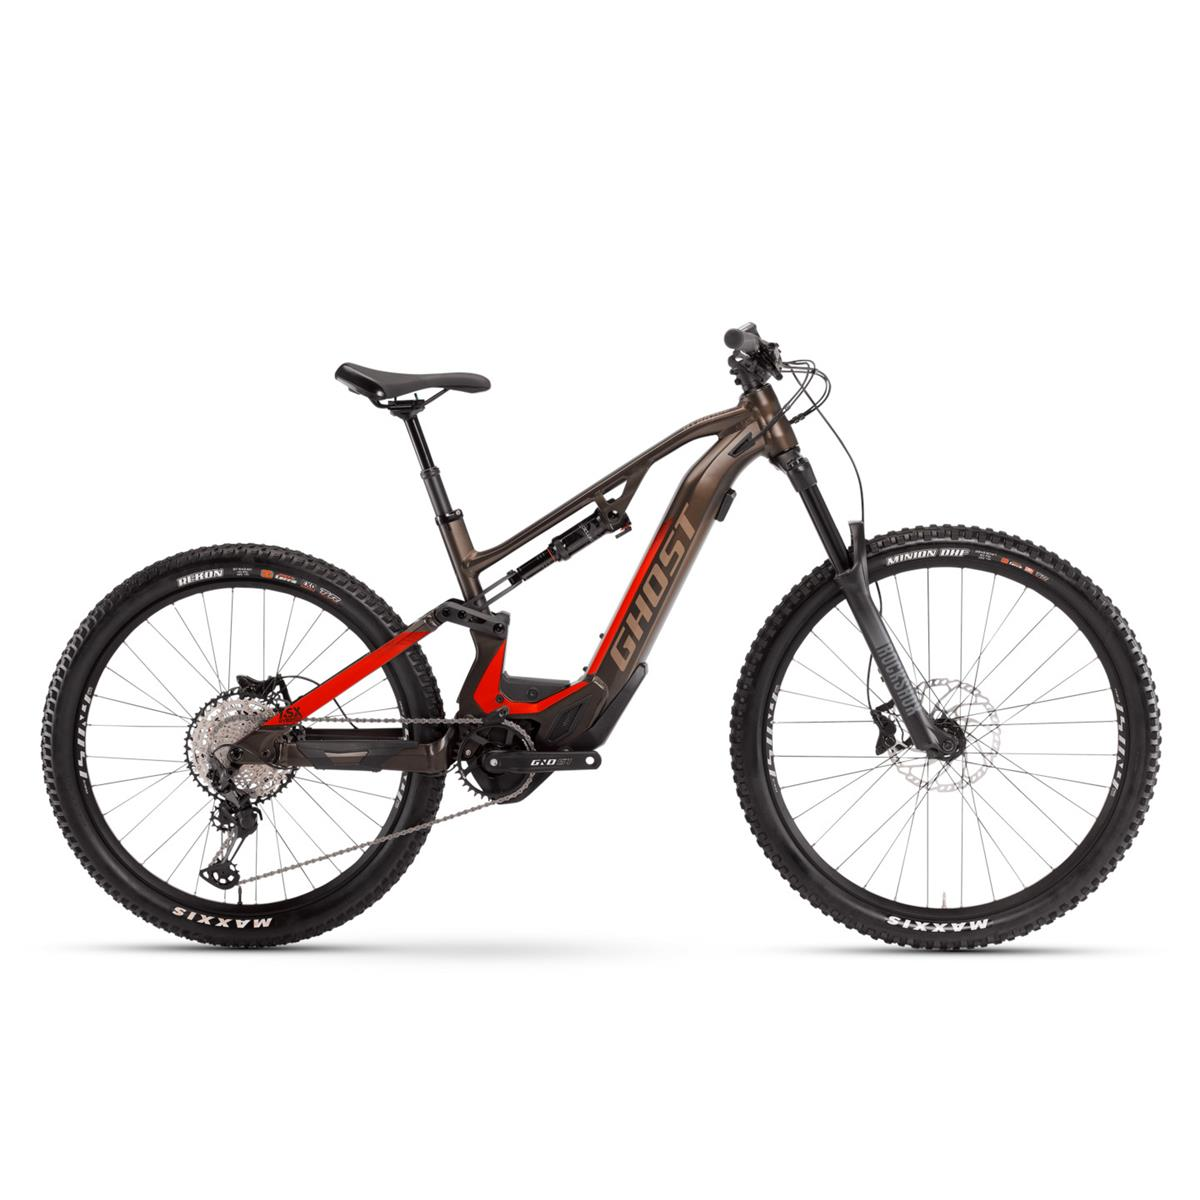 Hybride ASX Essential 29''/27.5'' 160mm 12s Bosch CX 625Wh Brown 2021 Size S